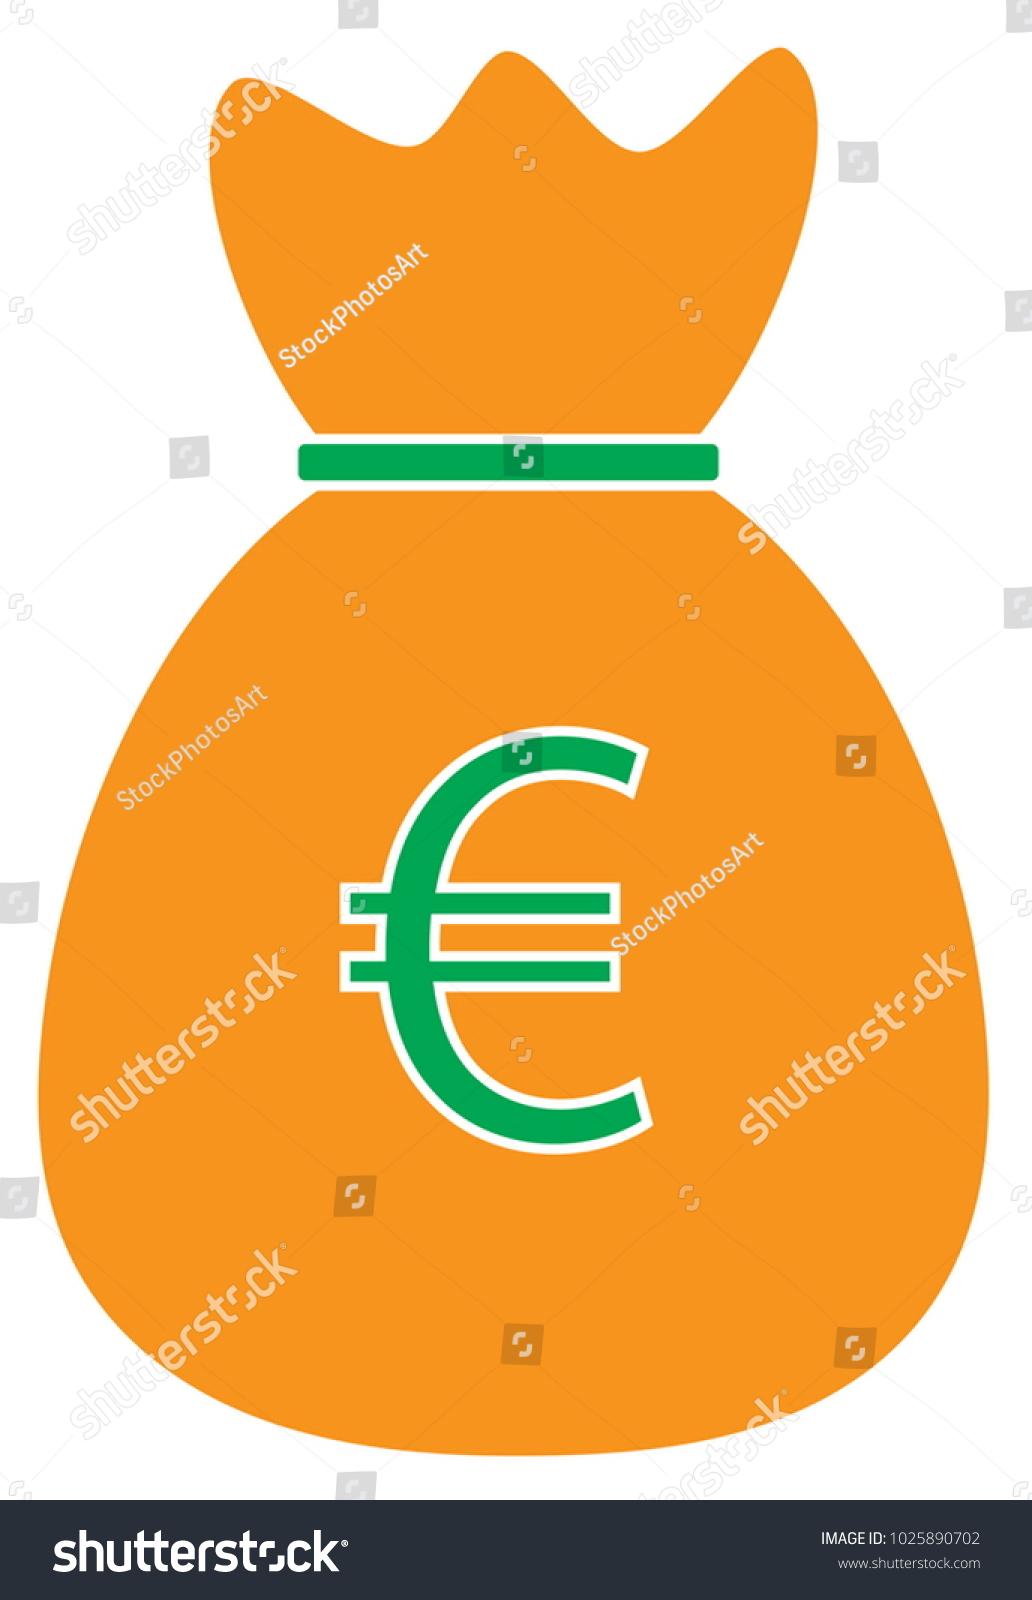 Euro currency icon logo vector over stock vector 1025890702 euro currency icon or logo vector over a money bag symbol for european union bank buycottarizona Choice Image